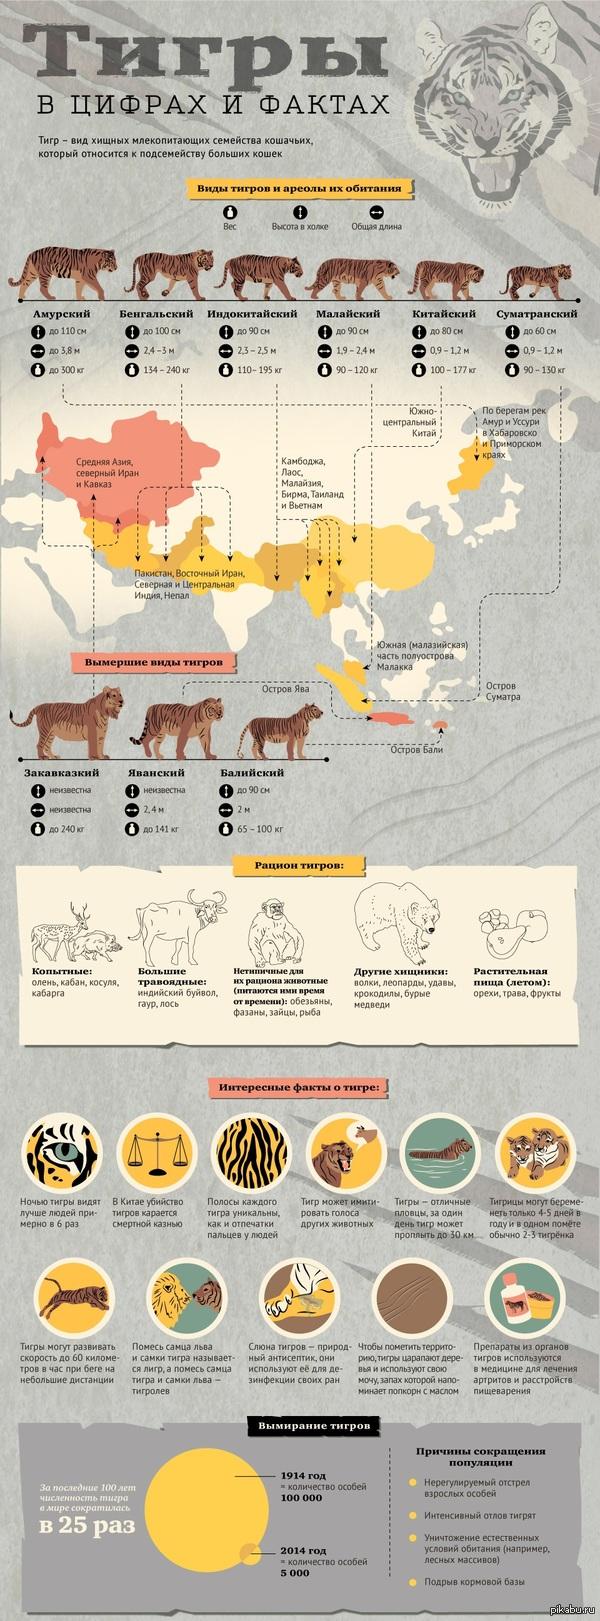 Тигры (в цифрах и фактах)